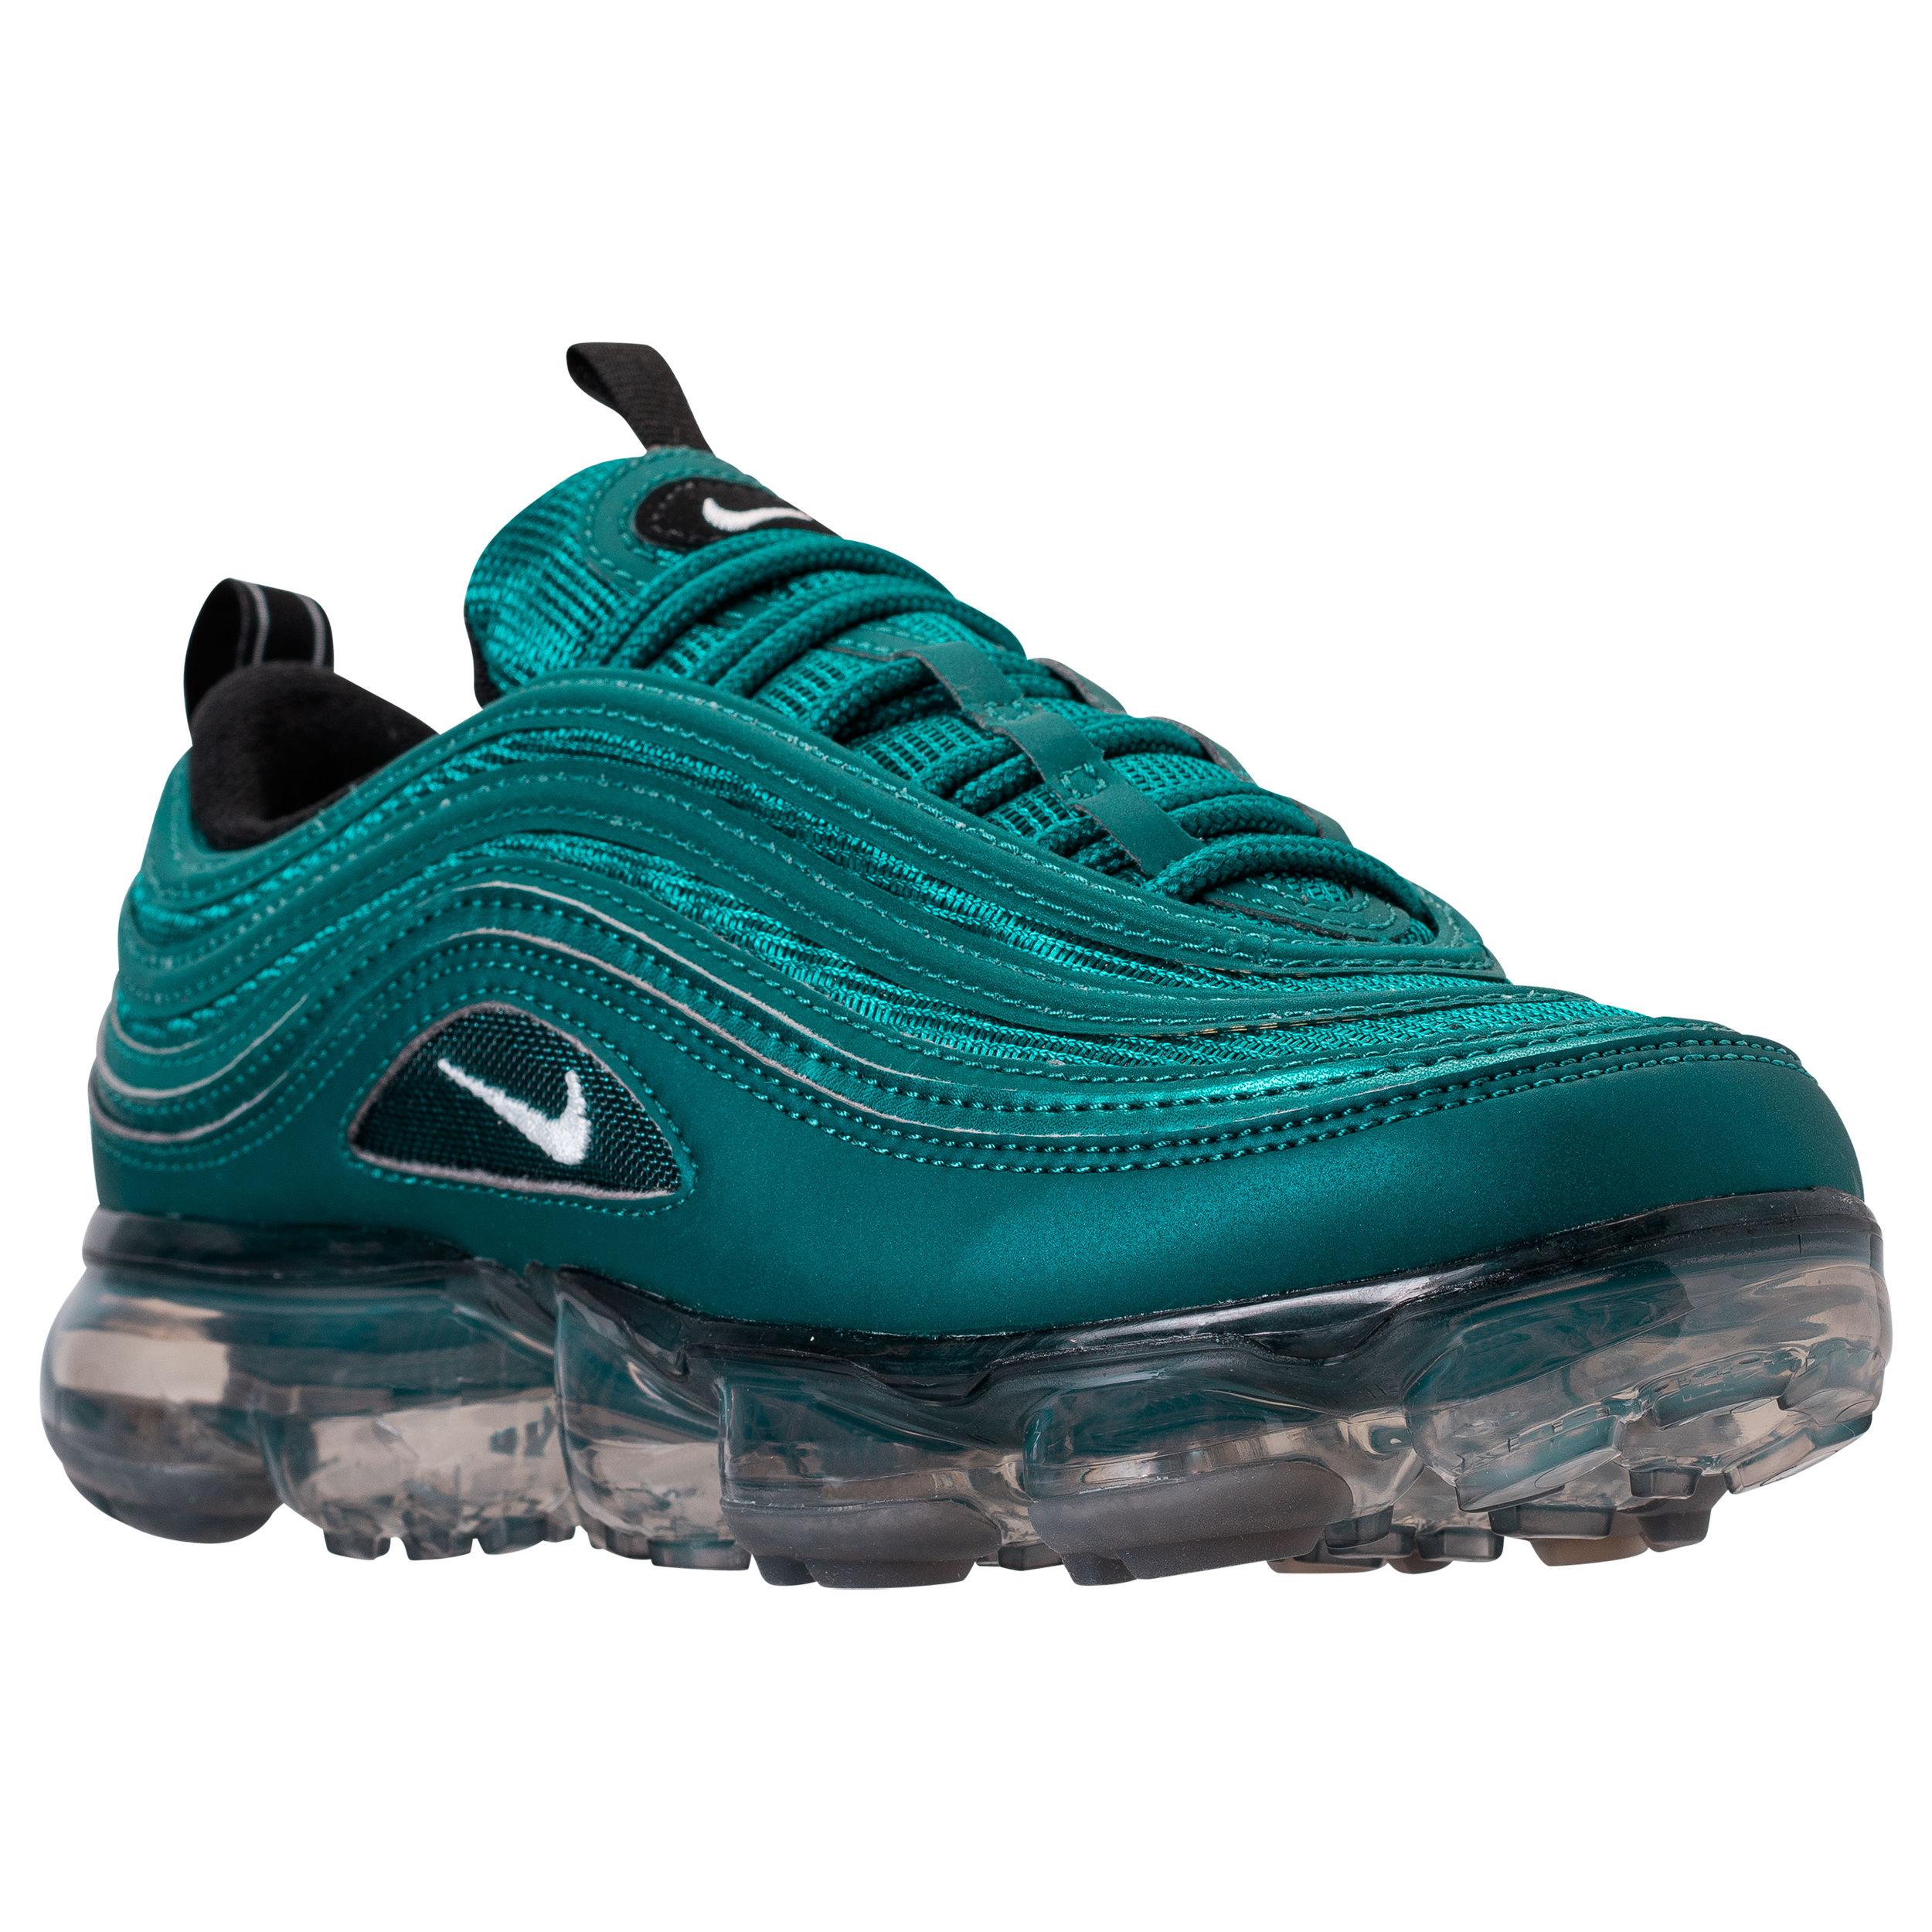 promo code efe3e 6d058 The Women's Nike Air VaporMax 97 'Dark Sea' Drops Next Week ...